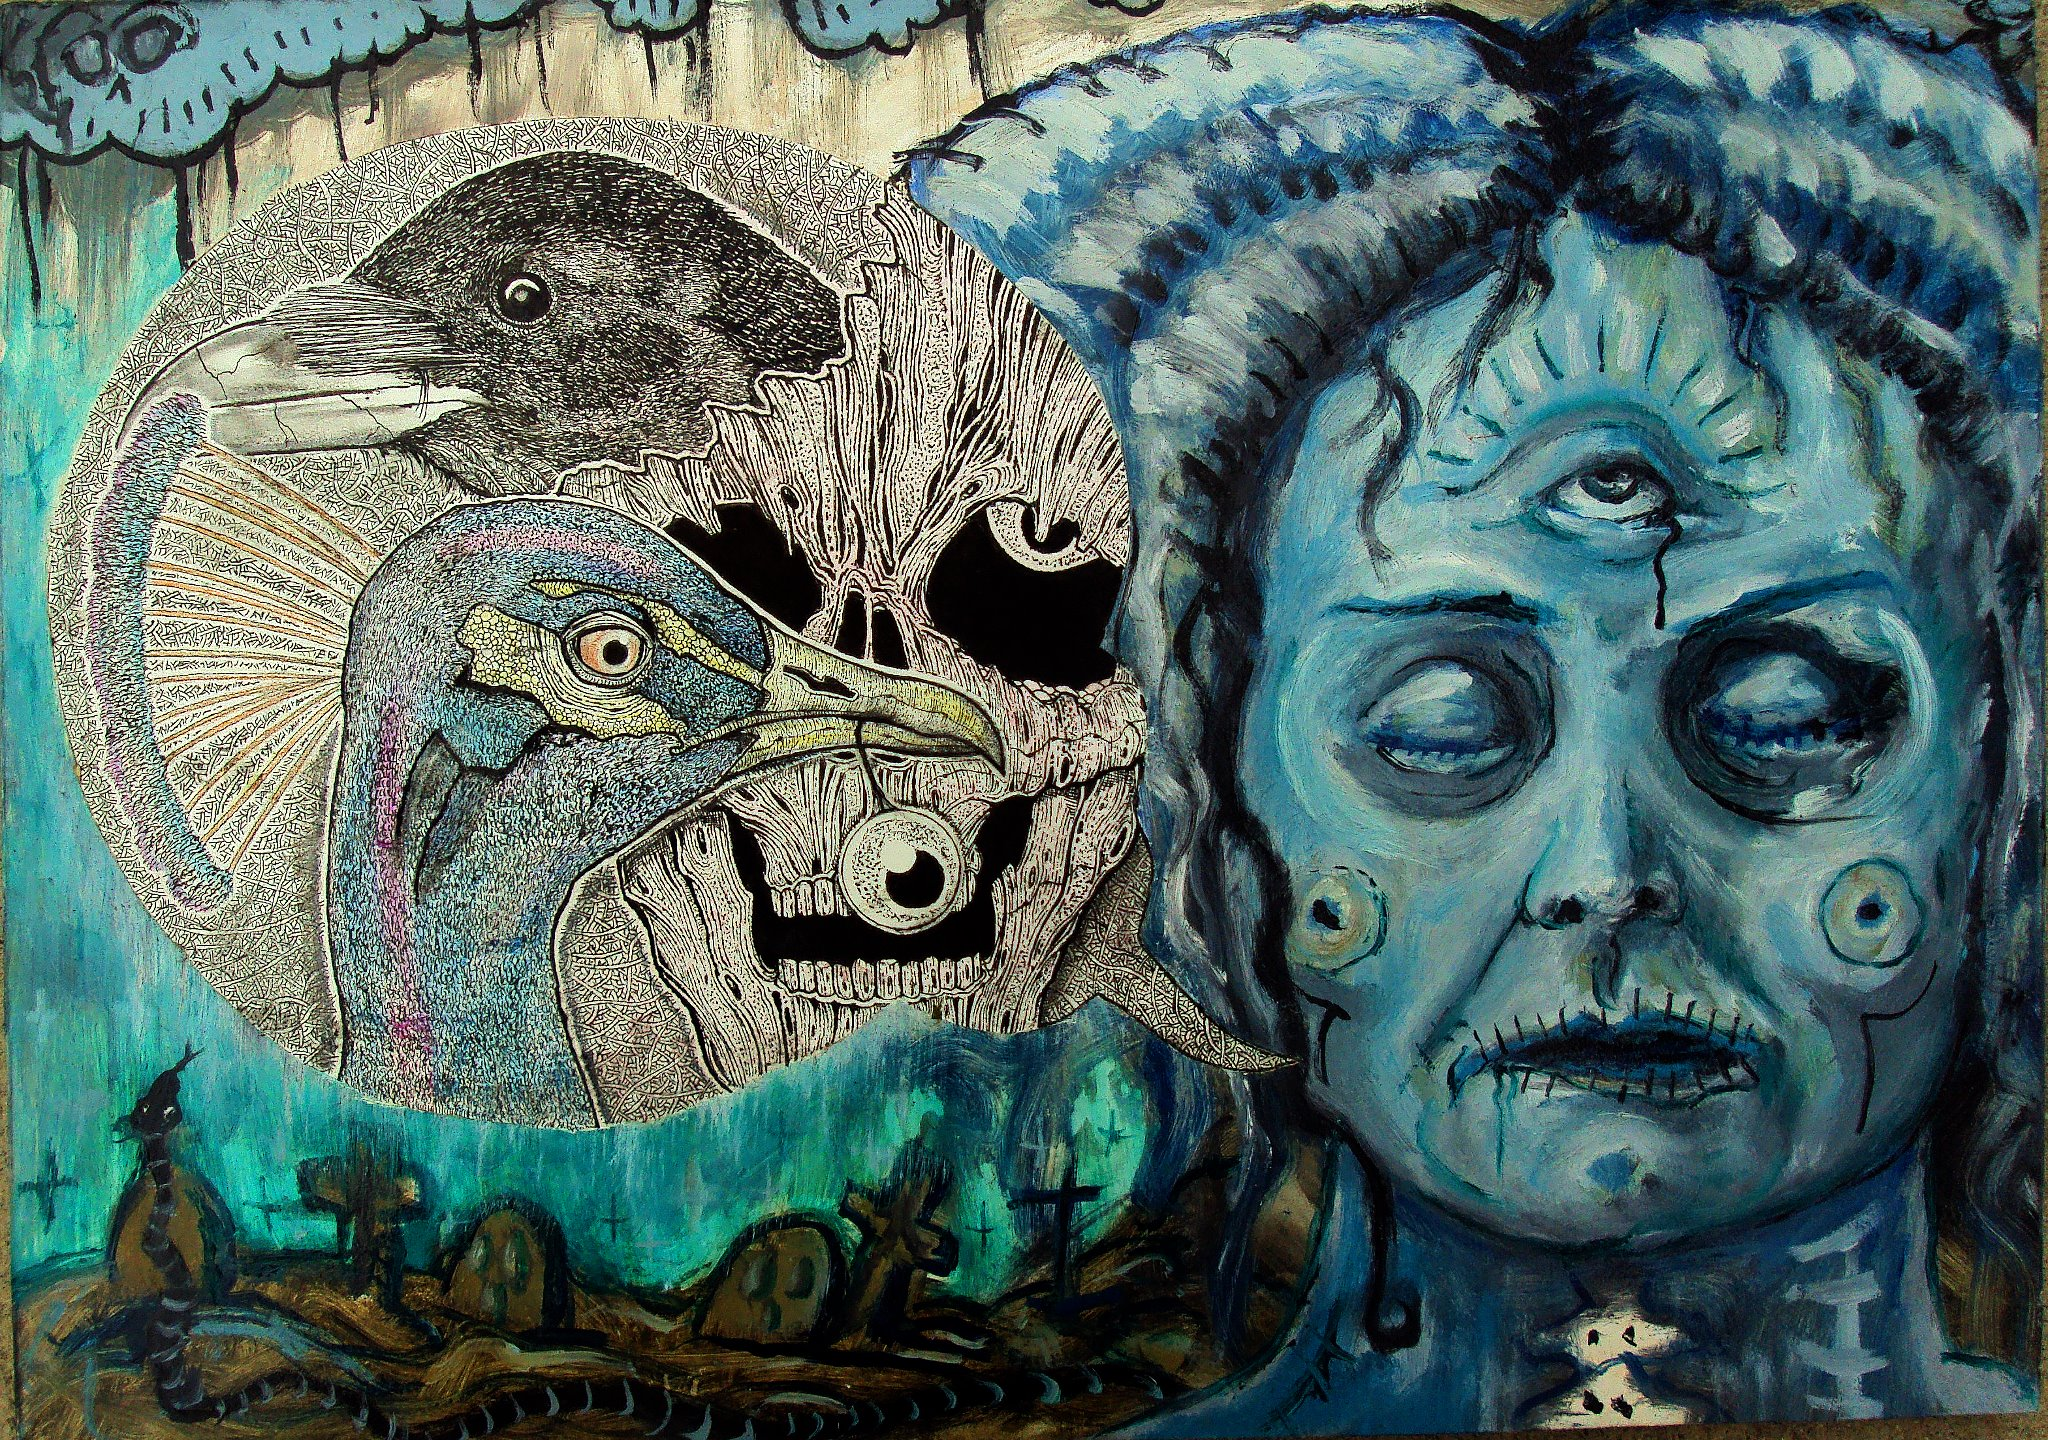 Occult Computer Wallpapers Desktop Backgrounds 2048x1440 ID 2048x1440